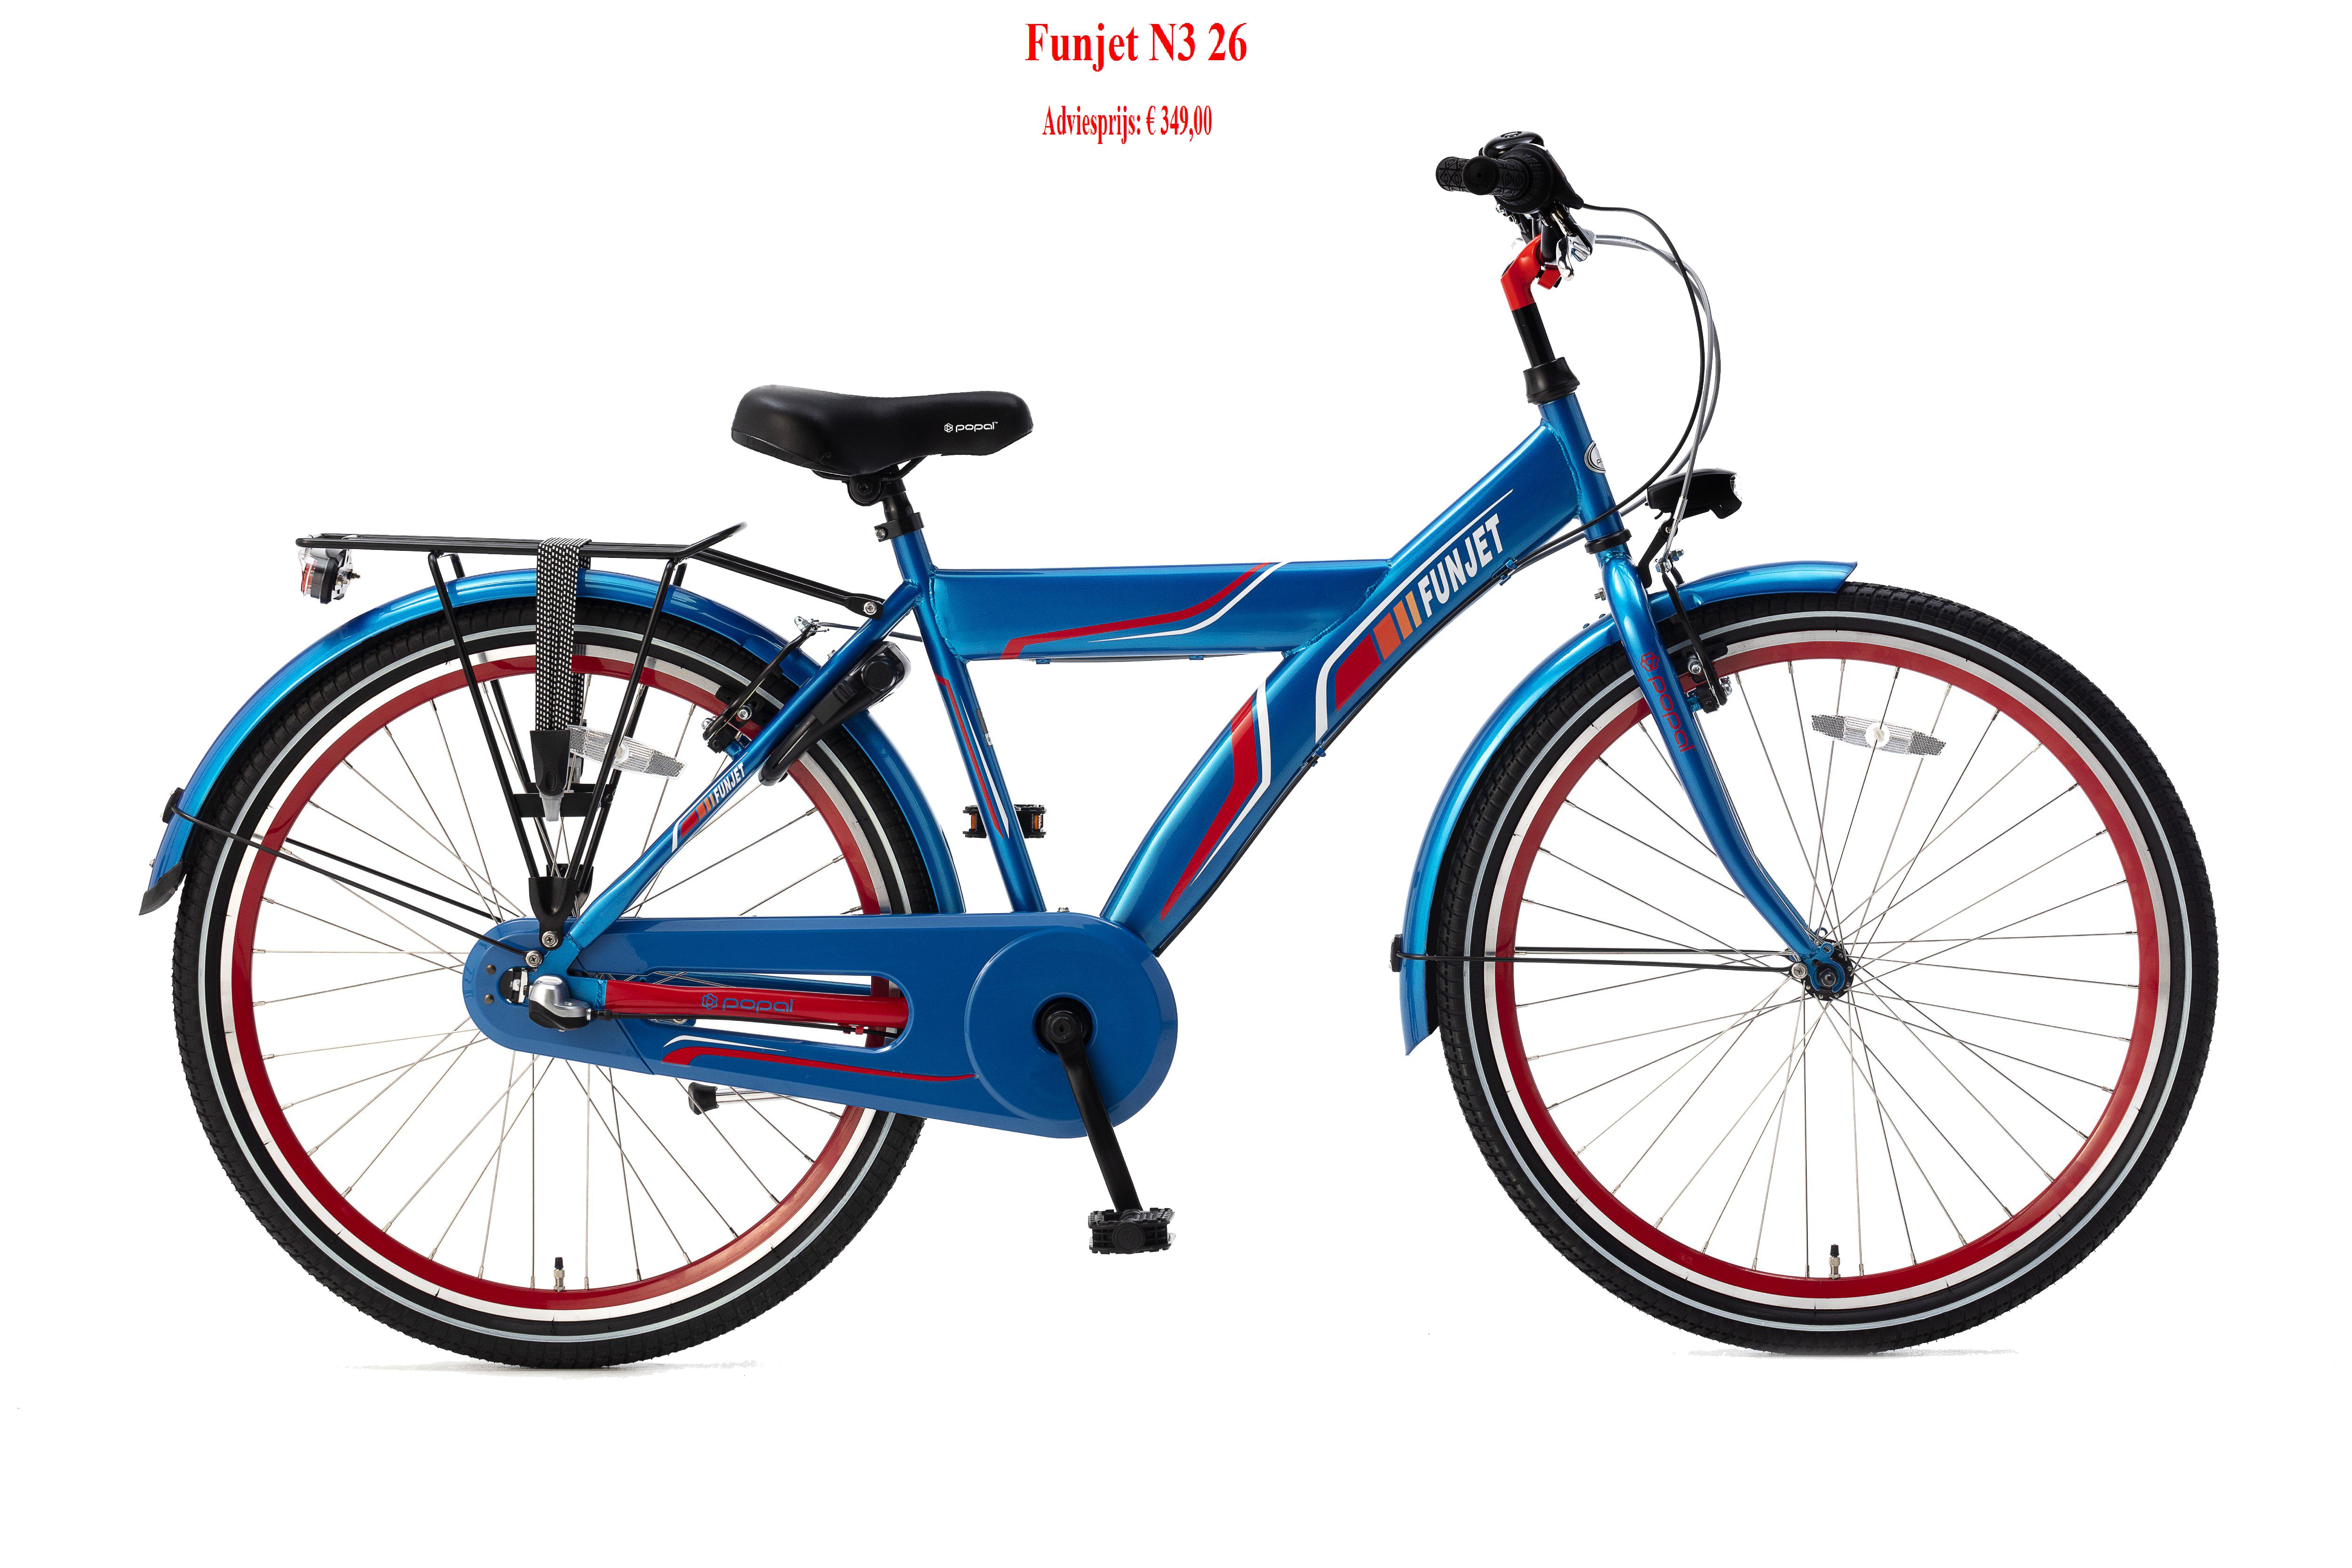 Funjet N3 26 Adviesprijs: € 349,00